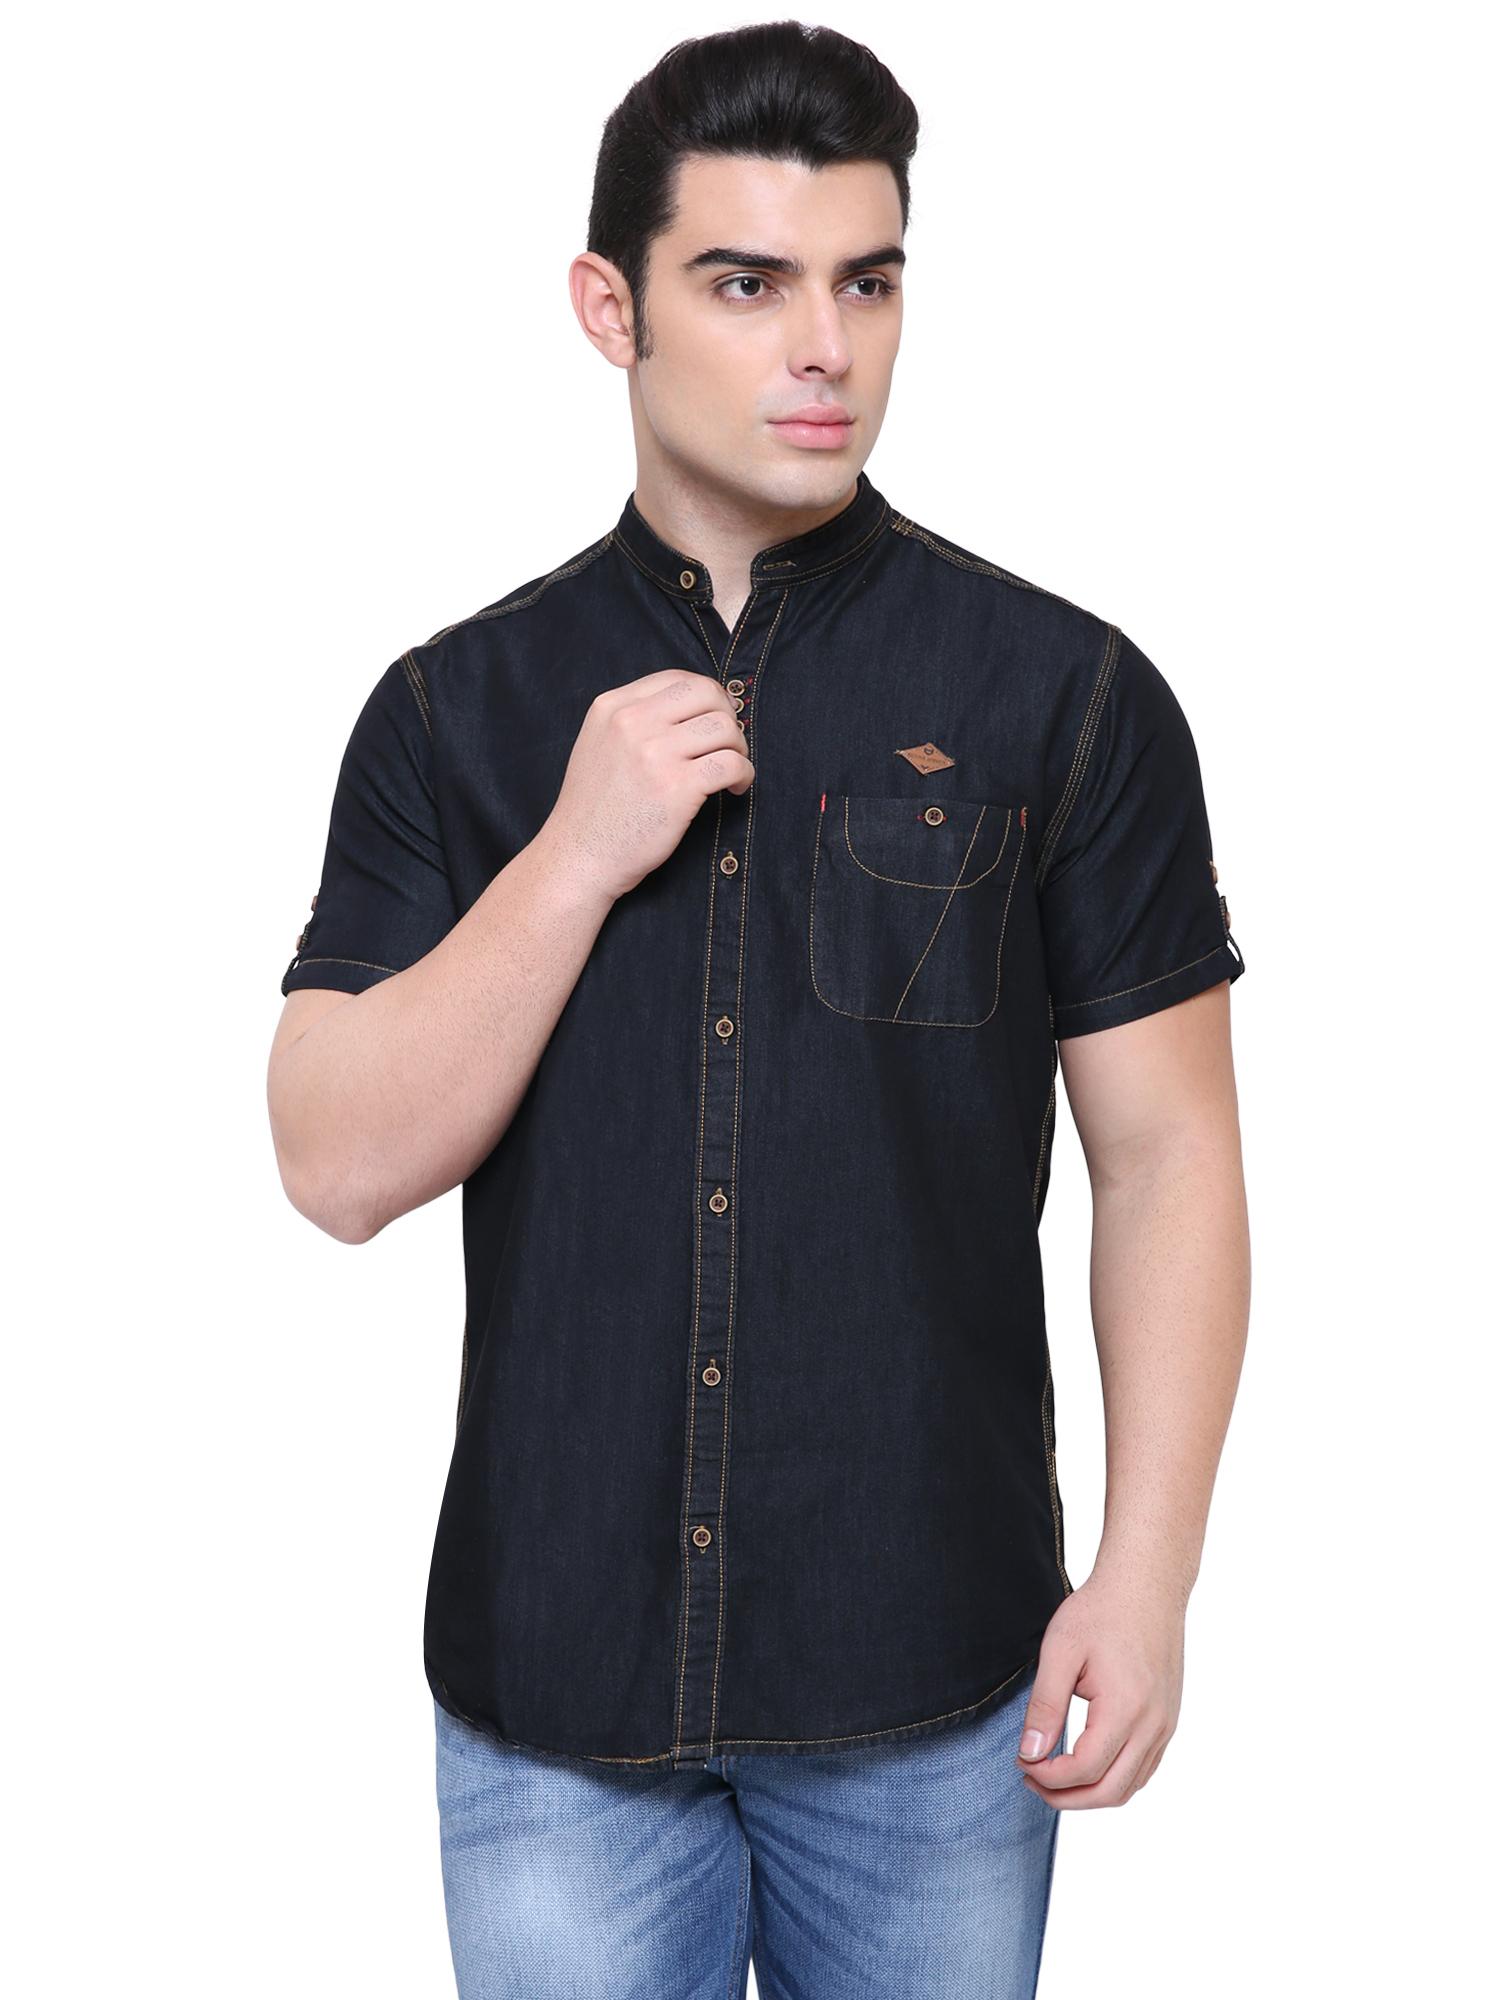 Kuons Avenue   Kuons Avenue Men's Black Half Sleeve Denim Shirt- KACLHS1179BK